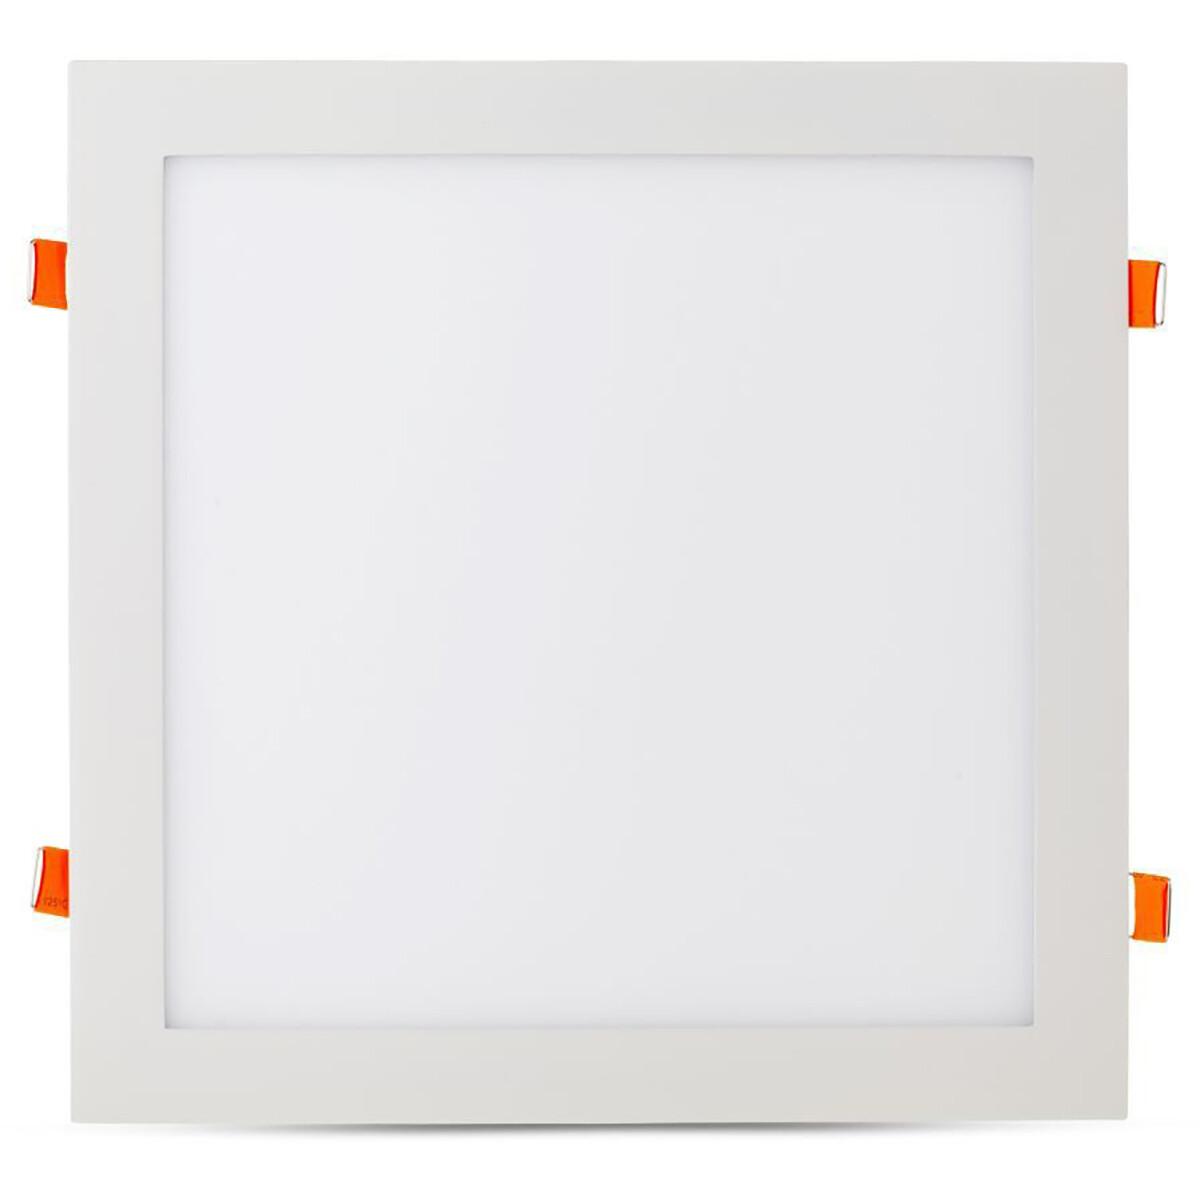 LED Downlight Slim - Viron Xisus - Inbouw Vierkant 24W - Helder/Koud Wit 6400K - Mat Wit - Aluminium